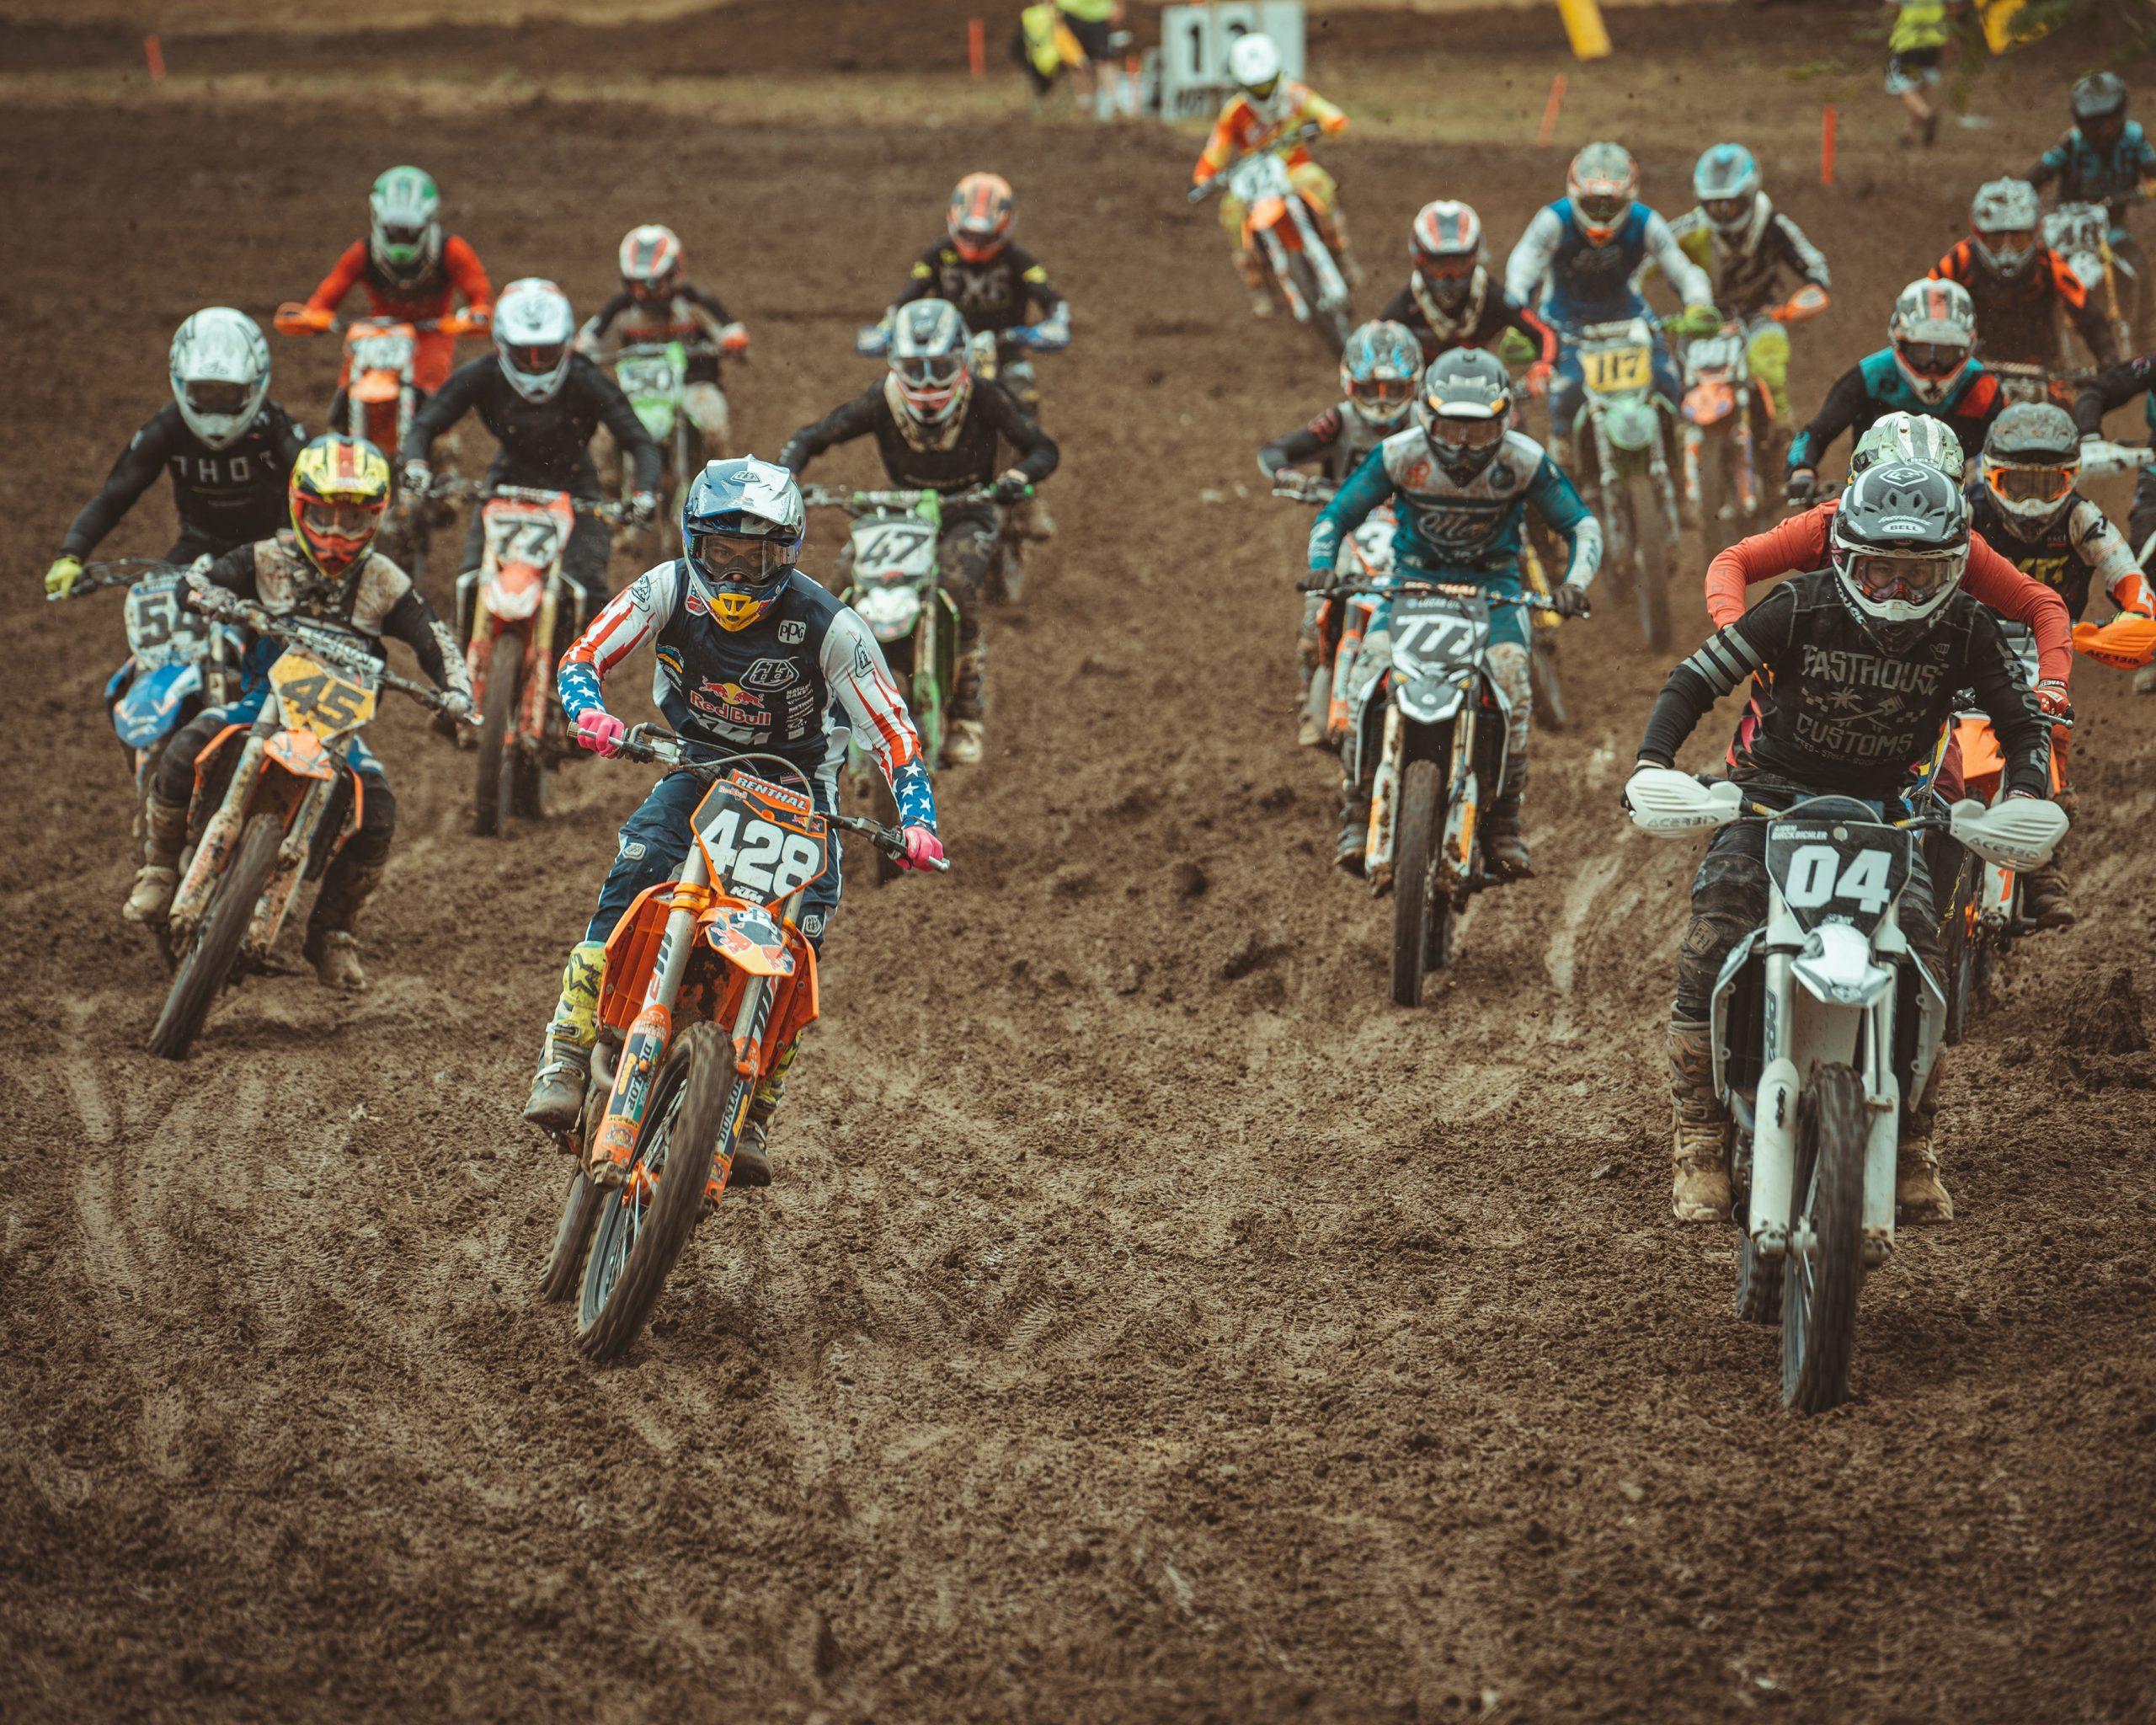 210401 The AMA Mid-East Loretta Lynn Area Qualifier will kick off the 2021 Ironman Raceway season